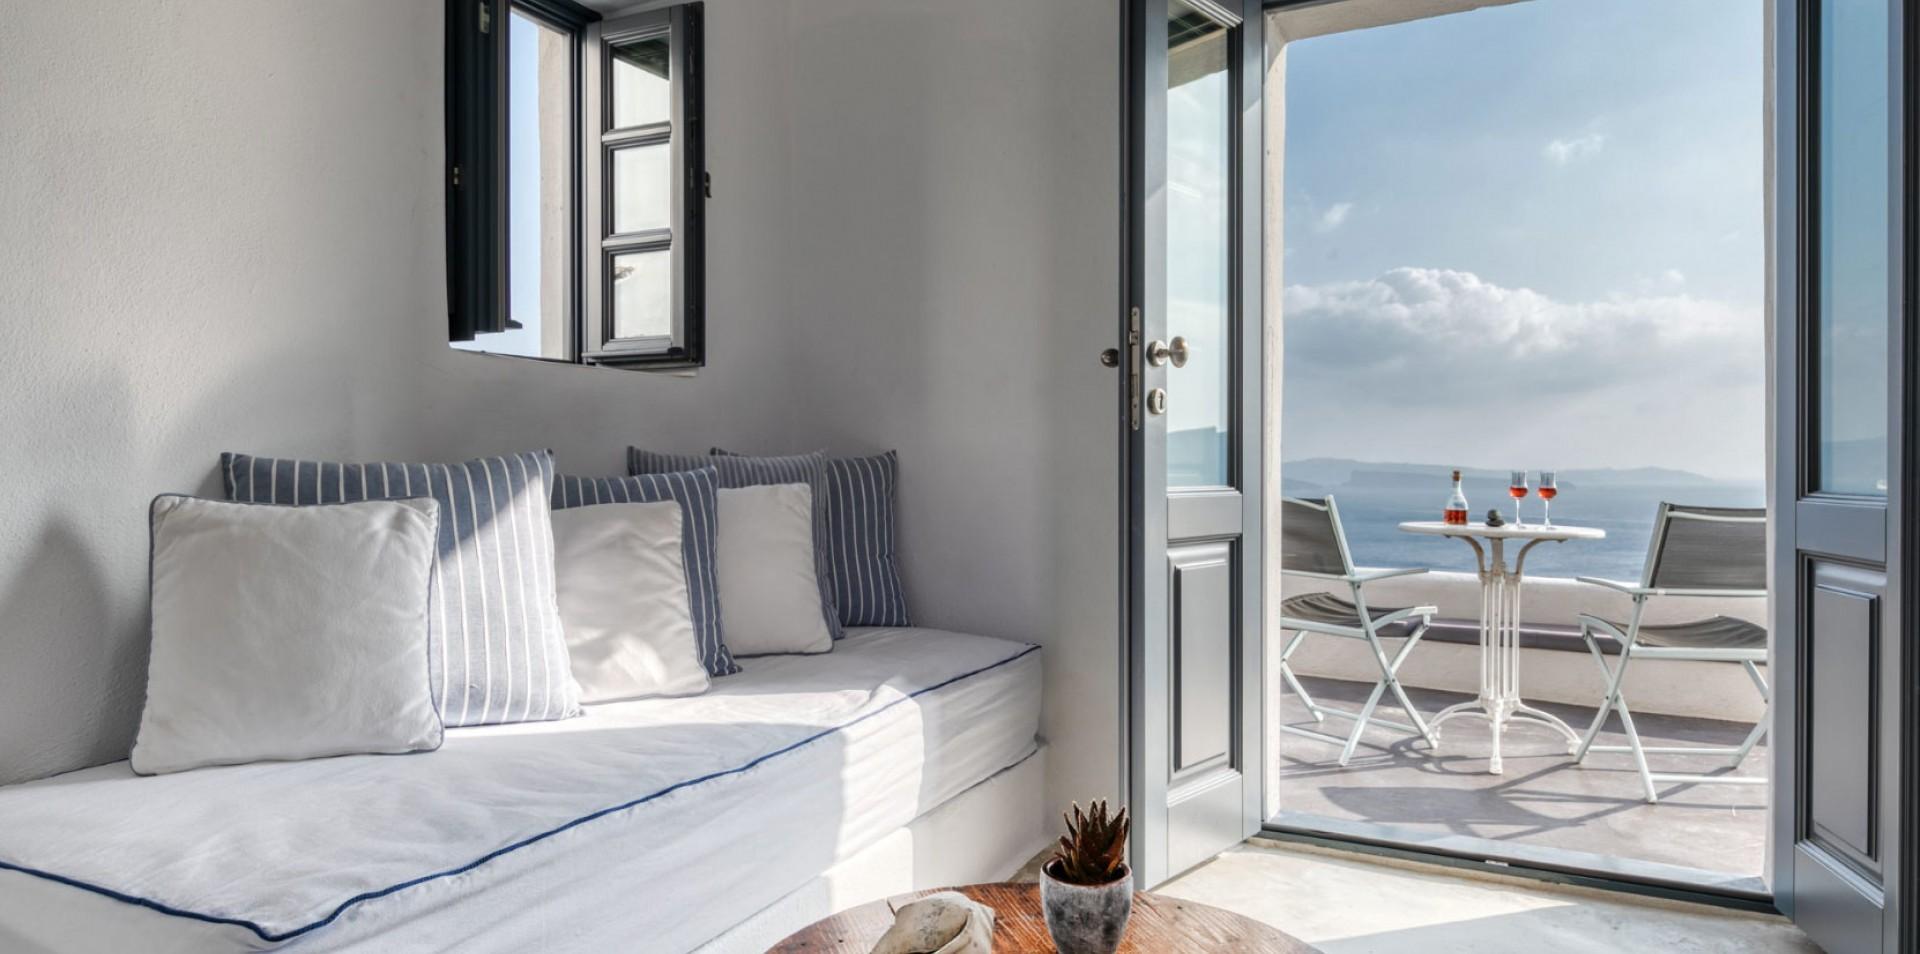 The interior of the luxury suite of Nostos Apartments in Oia Santorini